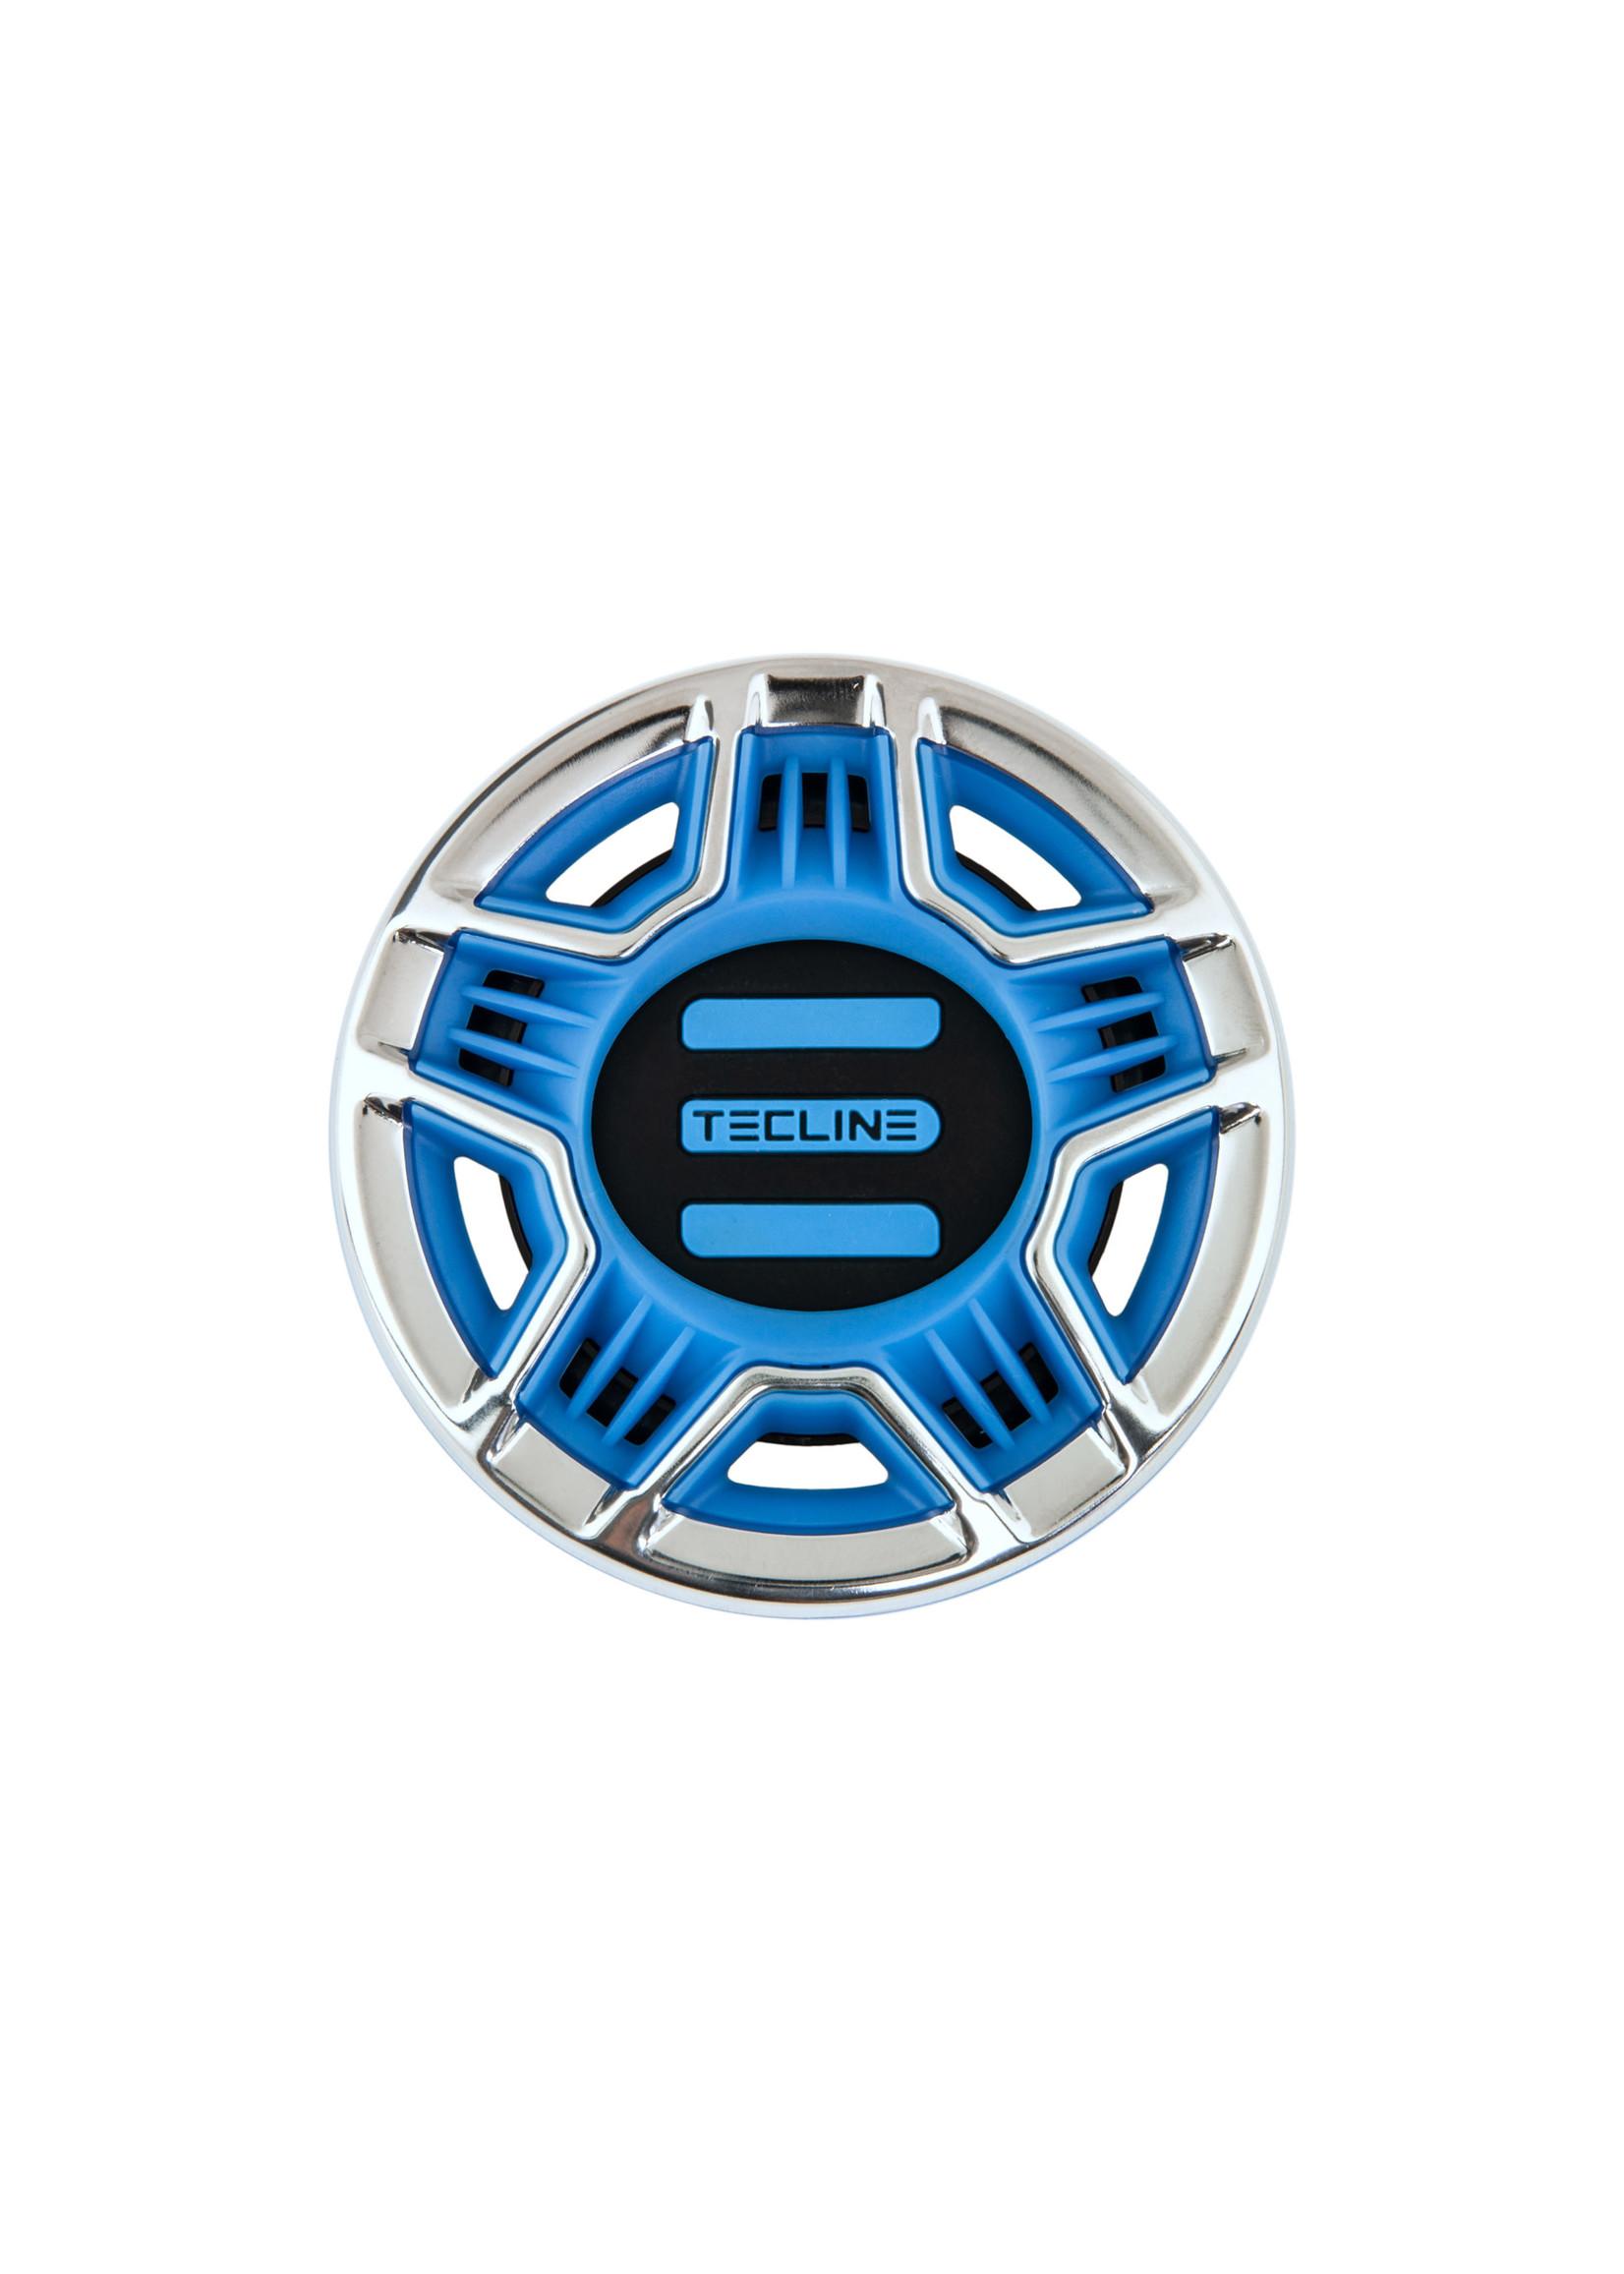 TecLine Tecline TEC2 Coloured Cover